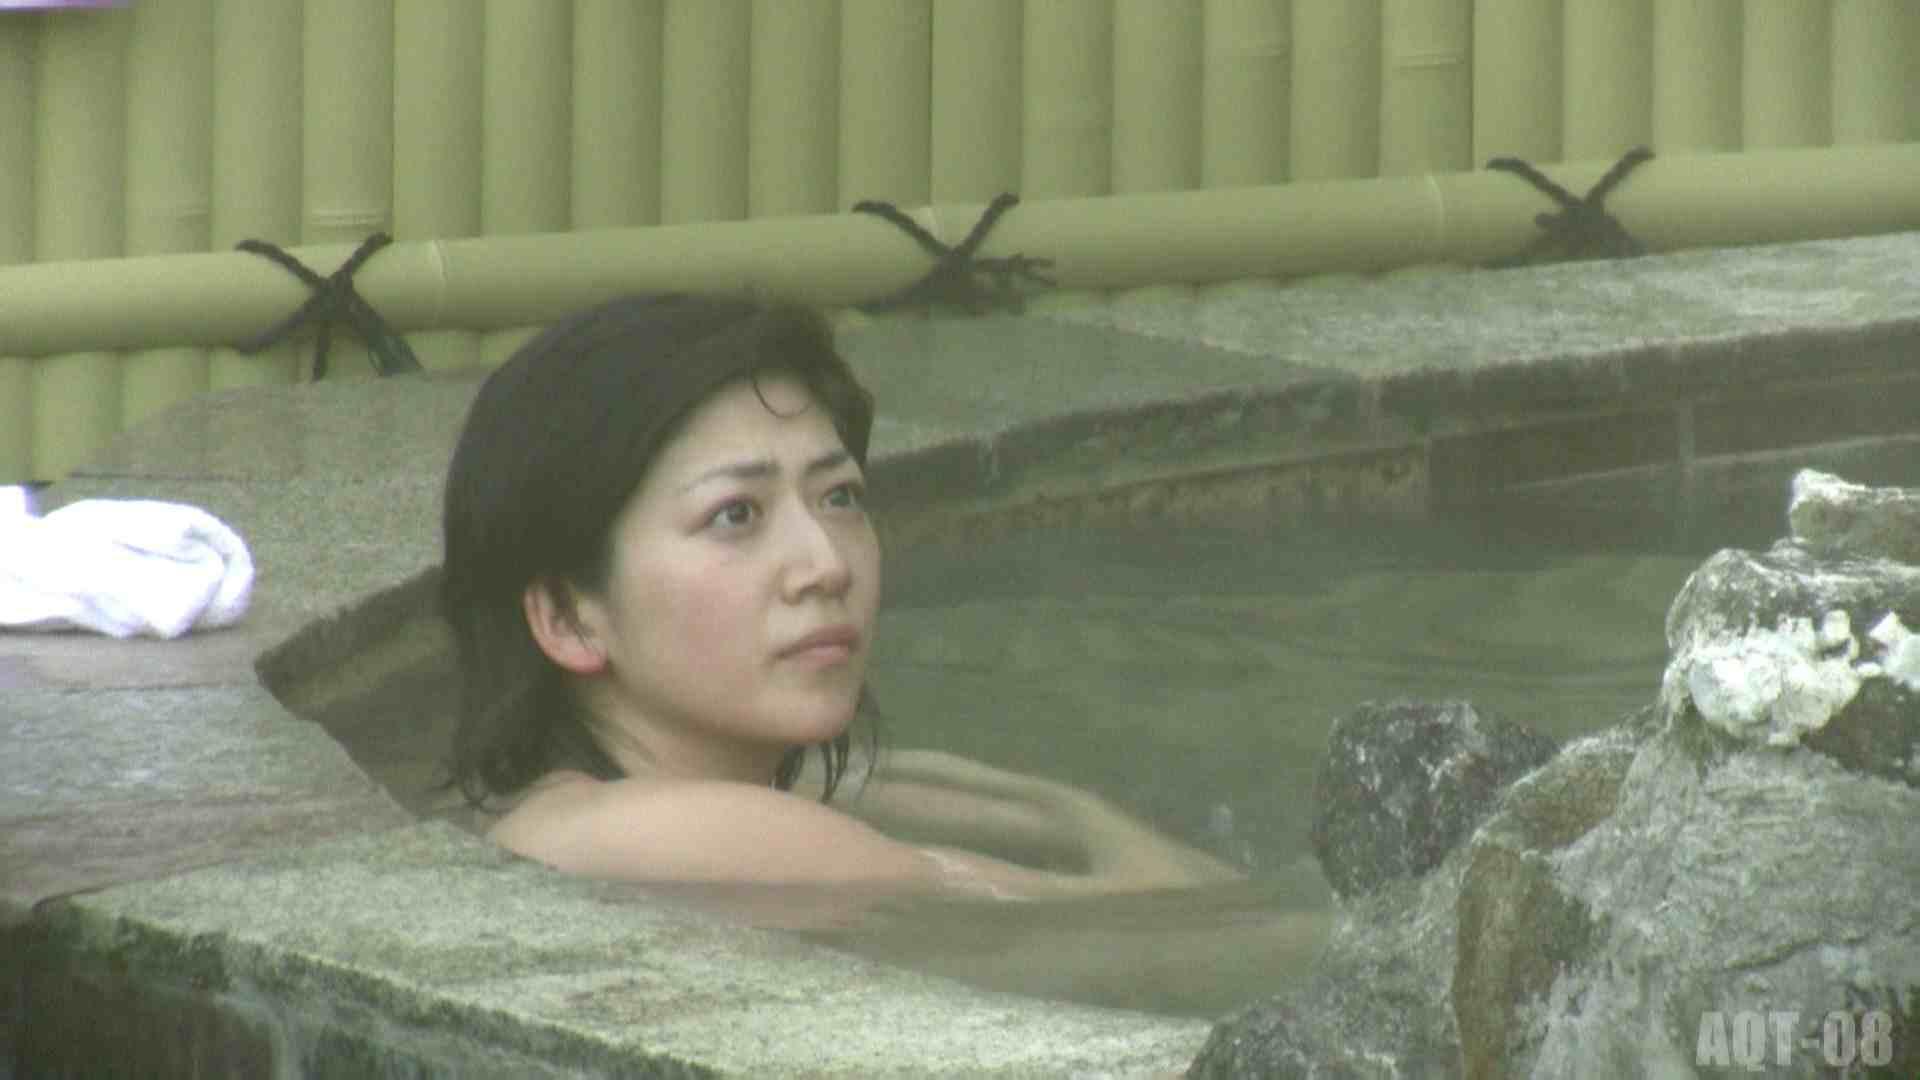 Aquaな露天風呂Vol.776 盗撮 エロ無料画像 108画像 86